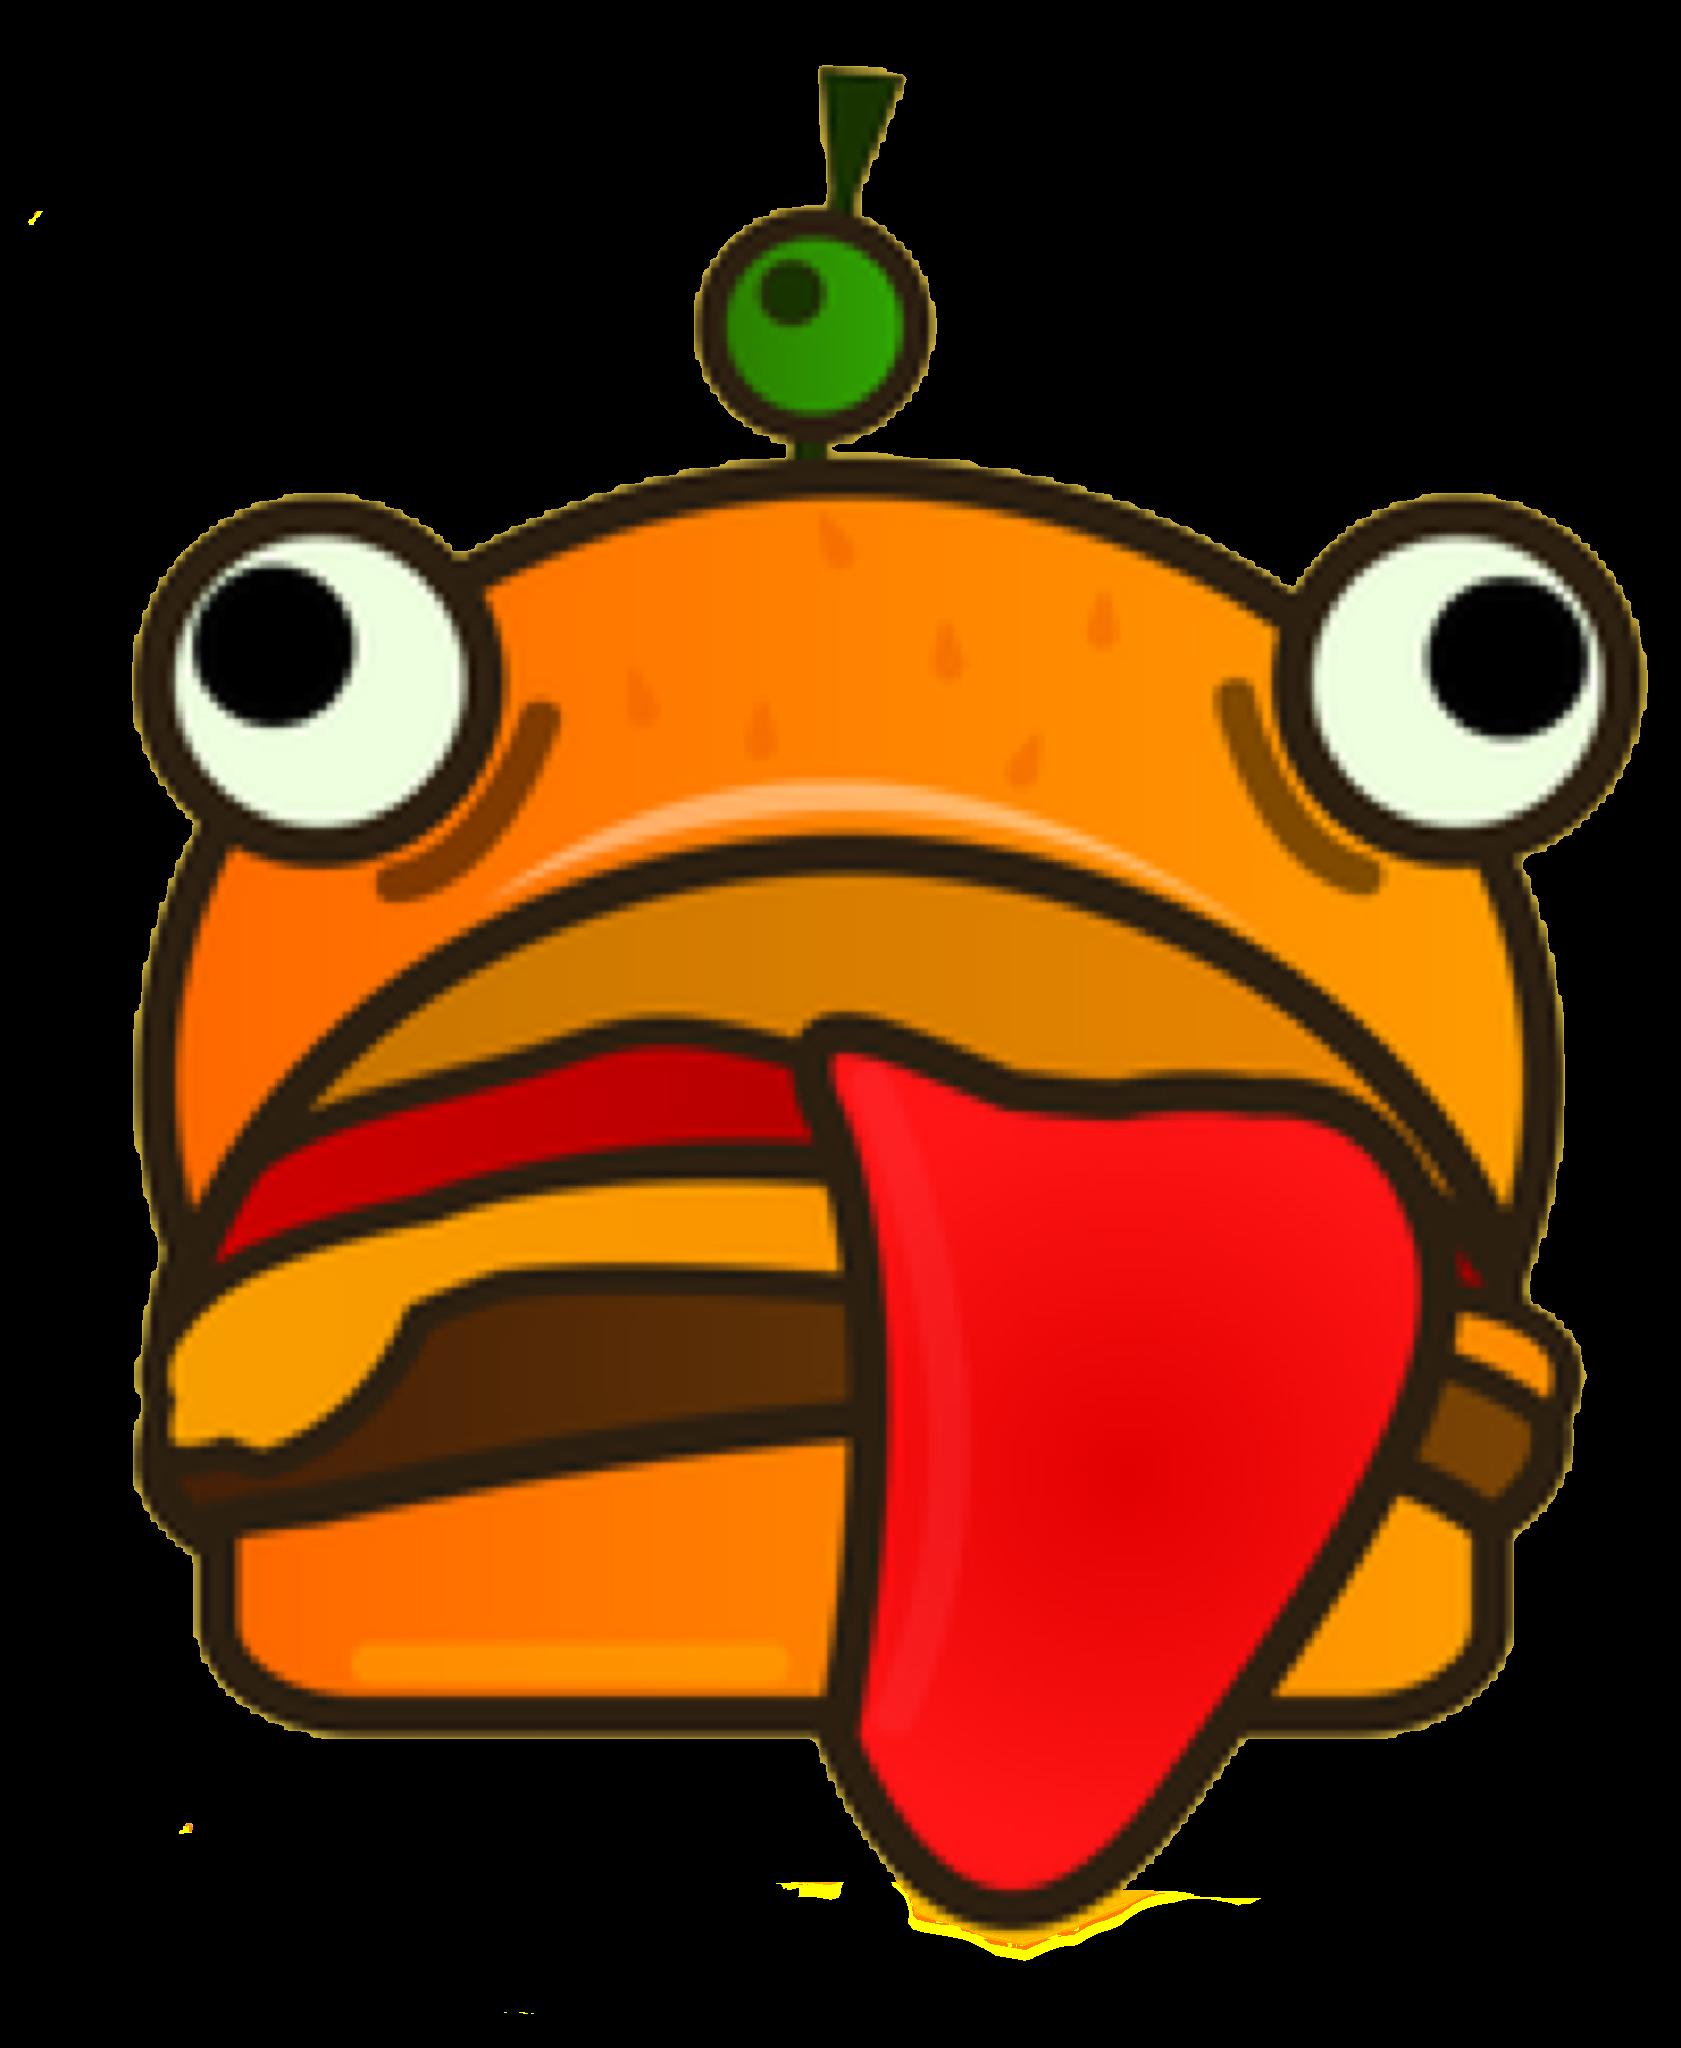 Durrr Burger PNG,DurrrBurger Fortnite, Video games